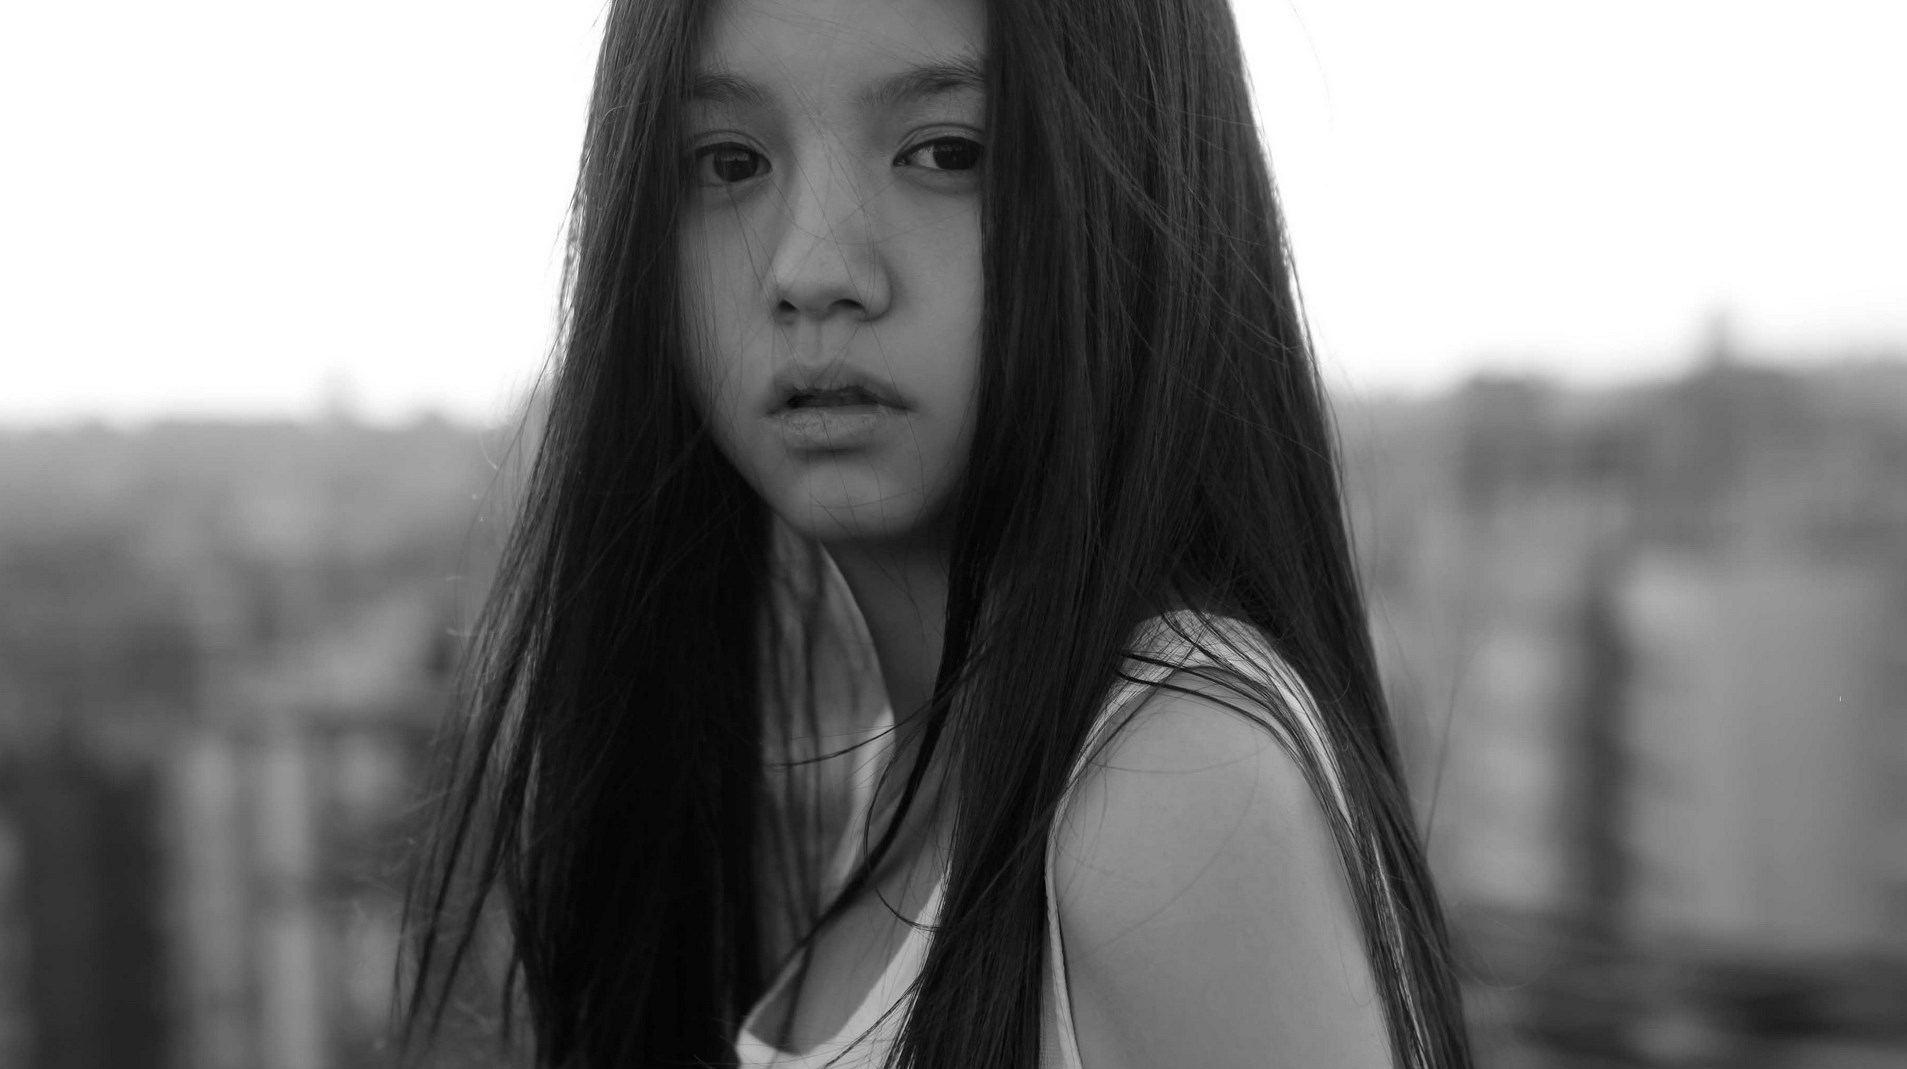 look-sad-beautifyl-girl-asian-girl-city-background-1063323994-e1562507590214.jpg